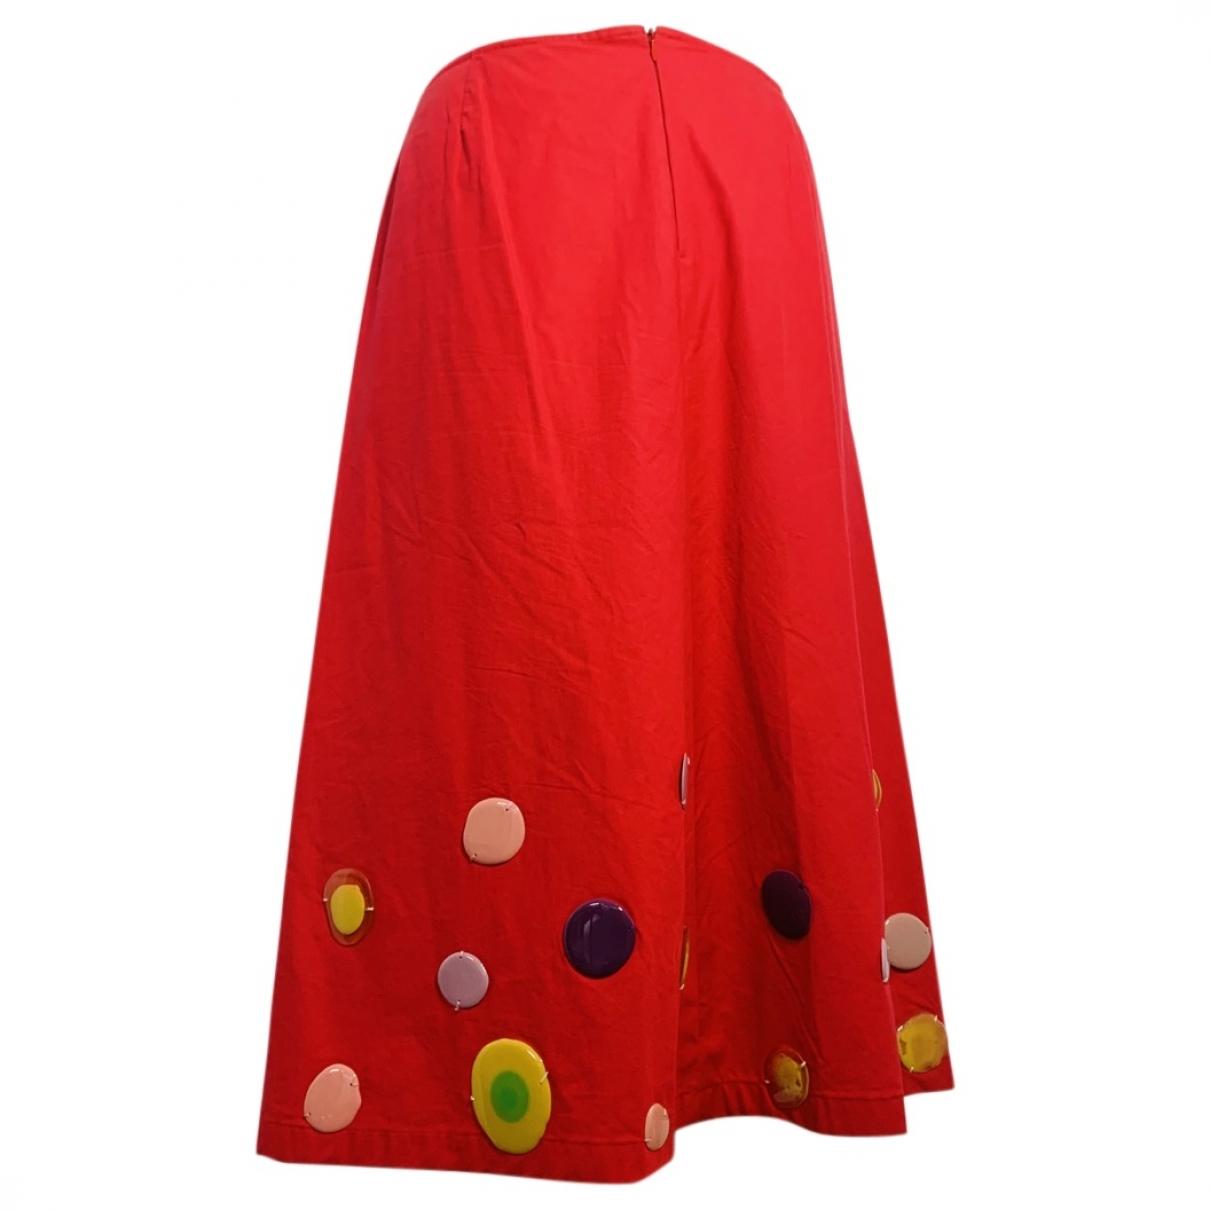 Marni \N Multicolour Cotton skirt for Women 42 IT